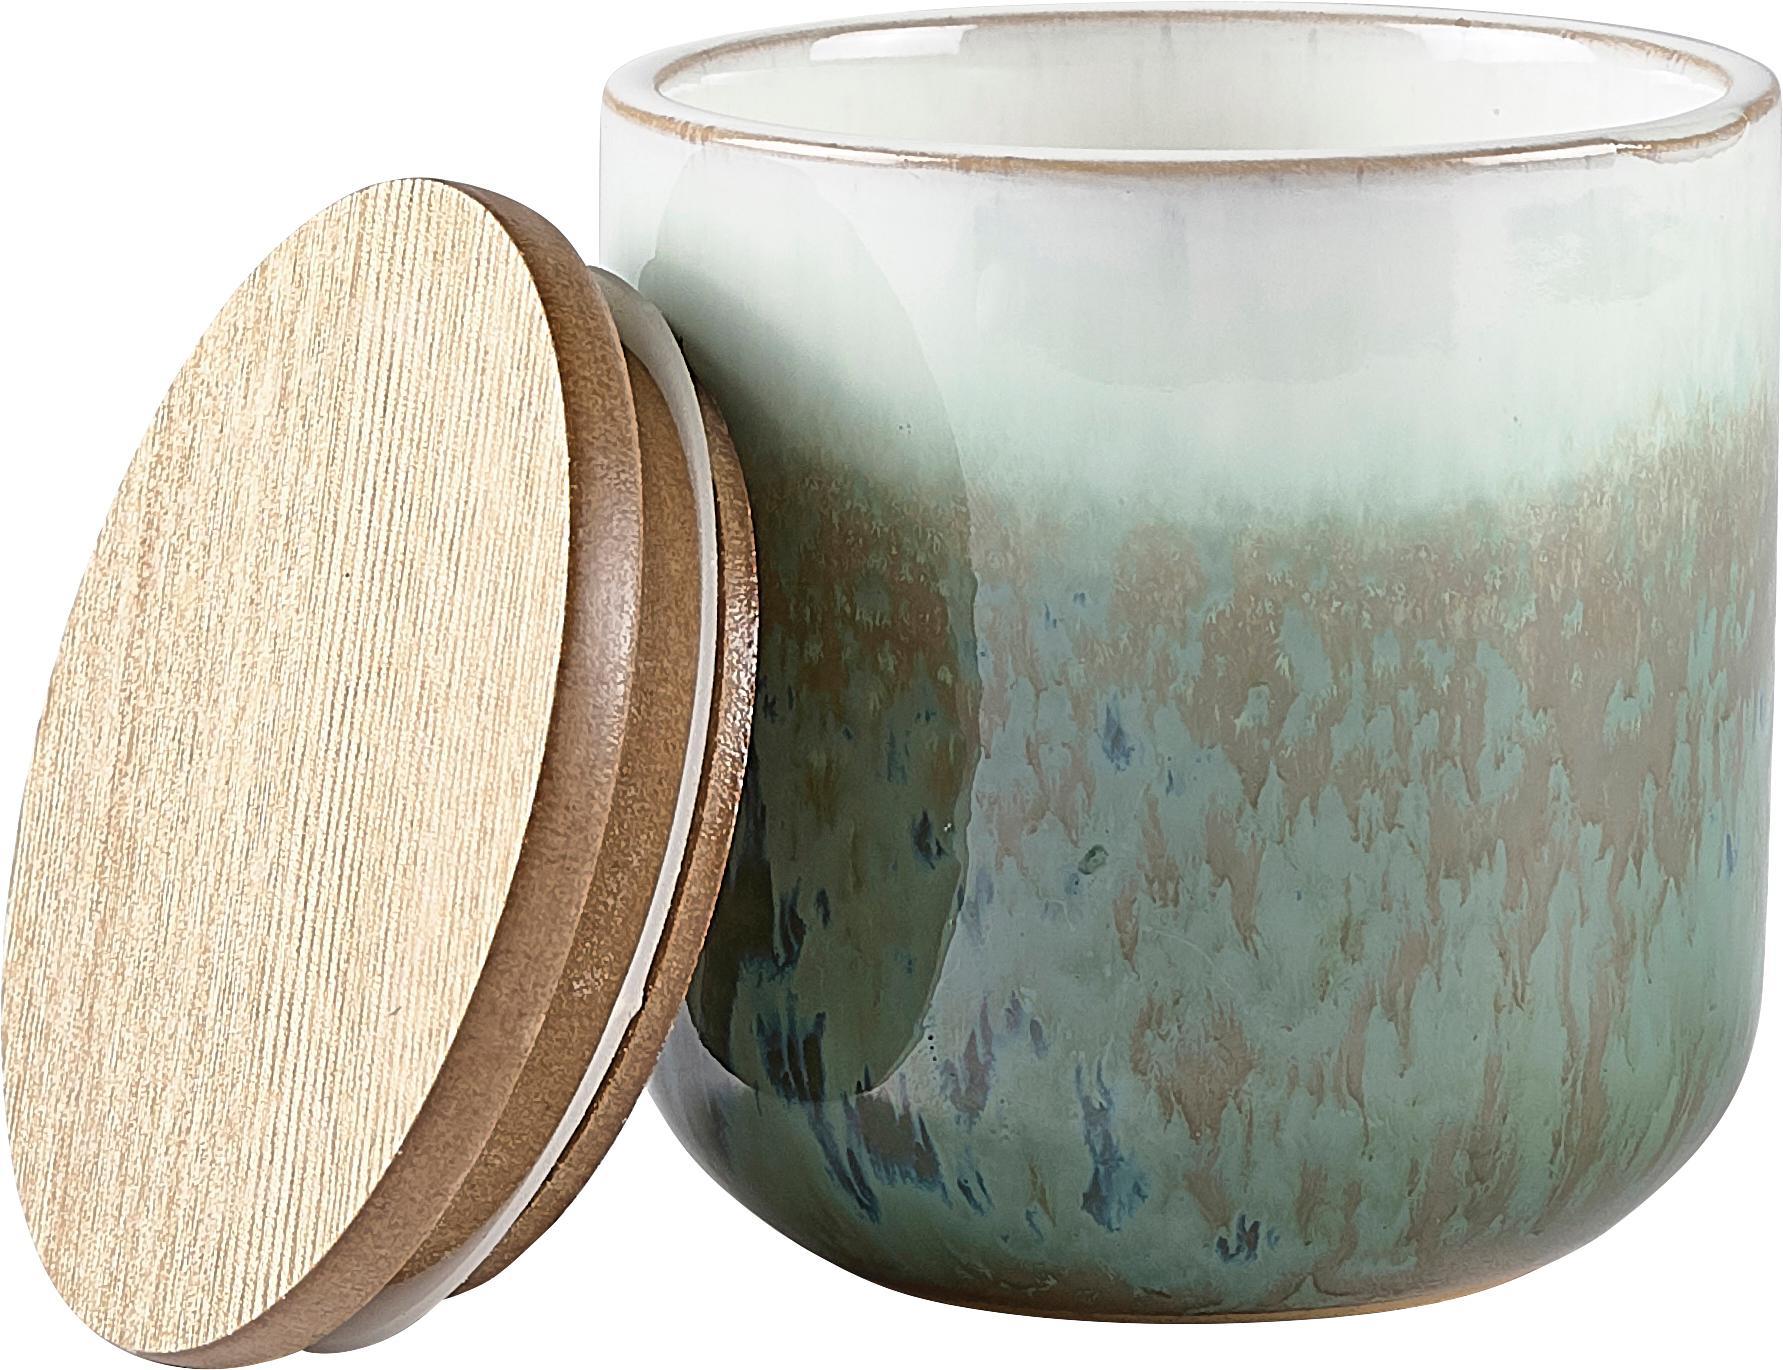 Duftkerze Cactus Blossom, Behälter: Keramik, Grüntöne, Beige, Weiß, Ø 9 x H 9 cm